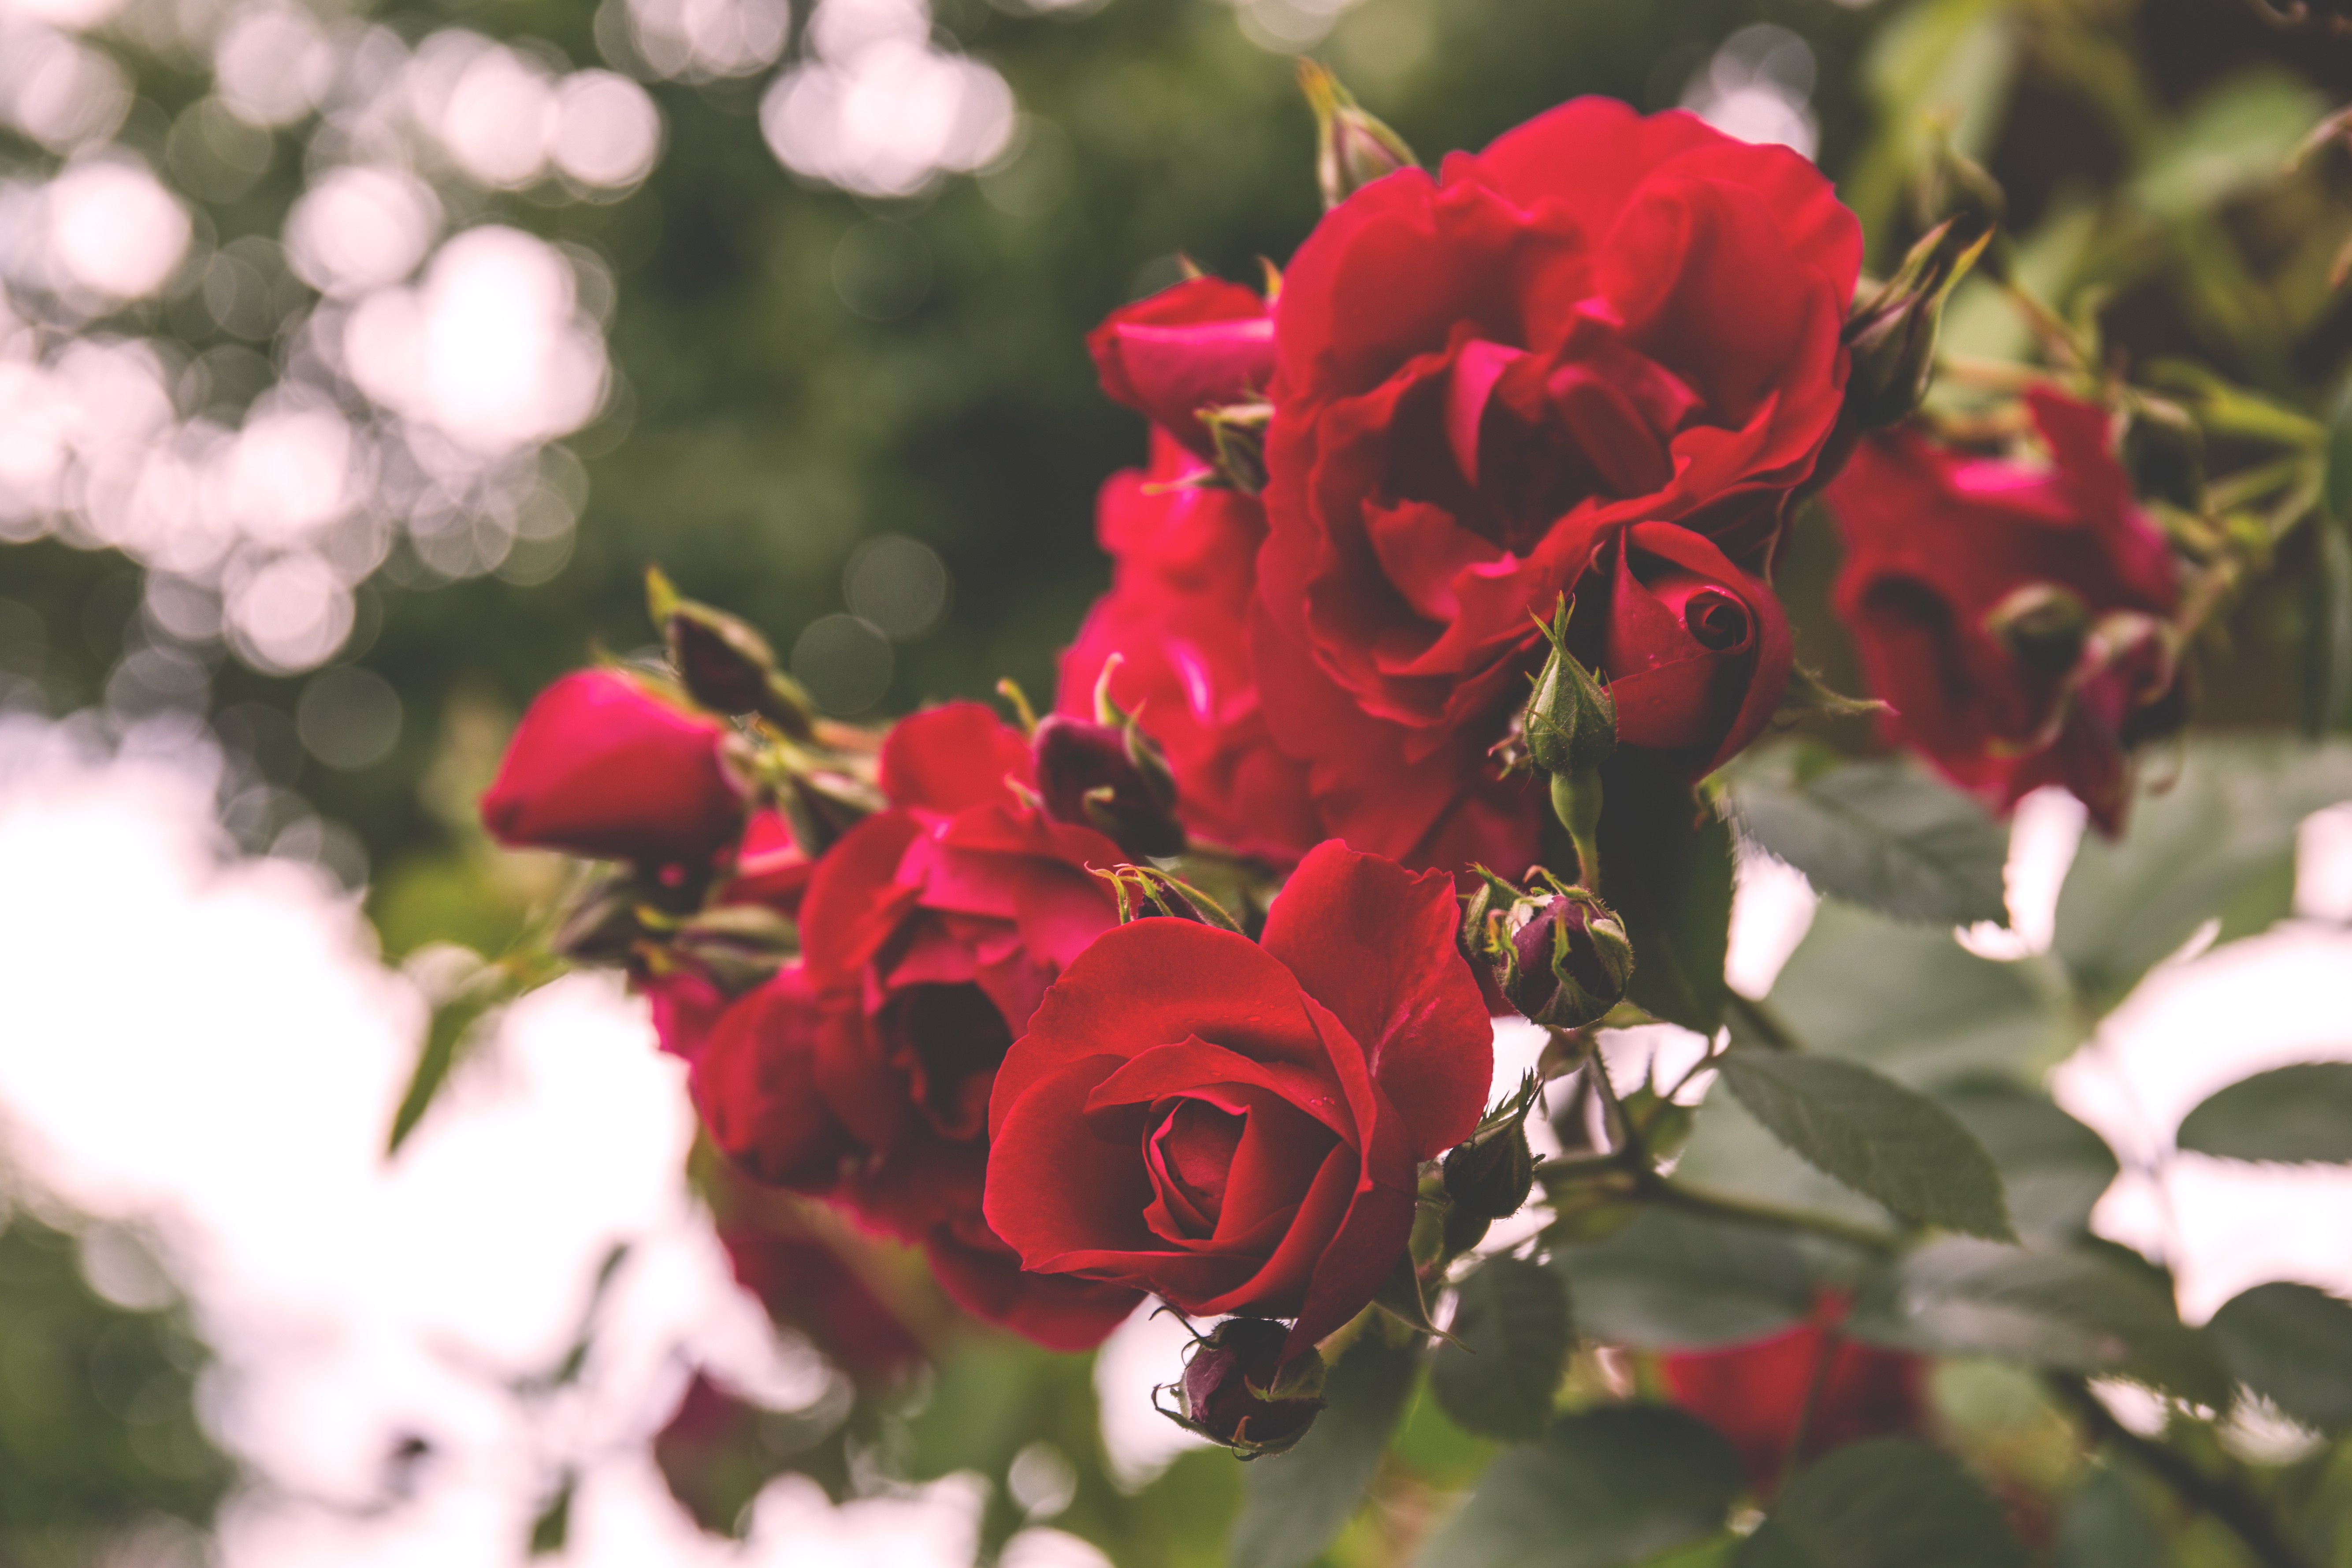 wild roses free stock photo. Black Bedroom Furniture Sets. Home Design Ideas